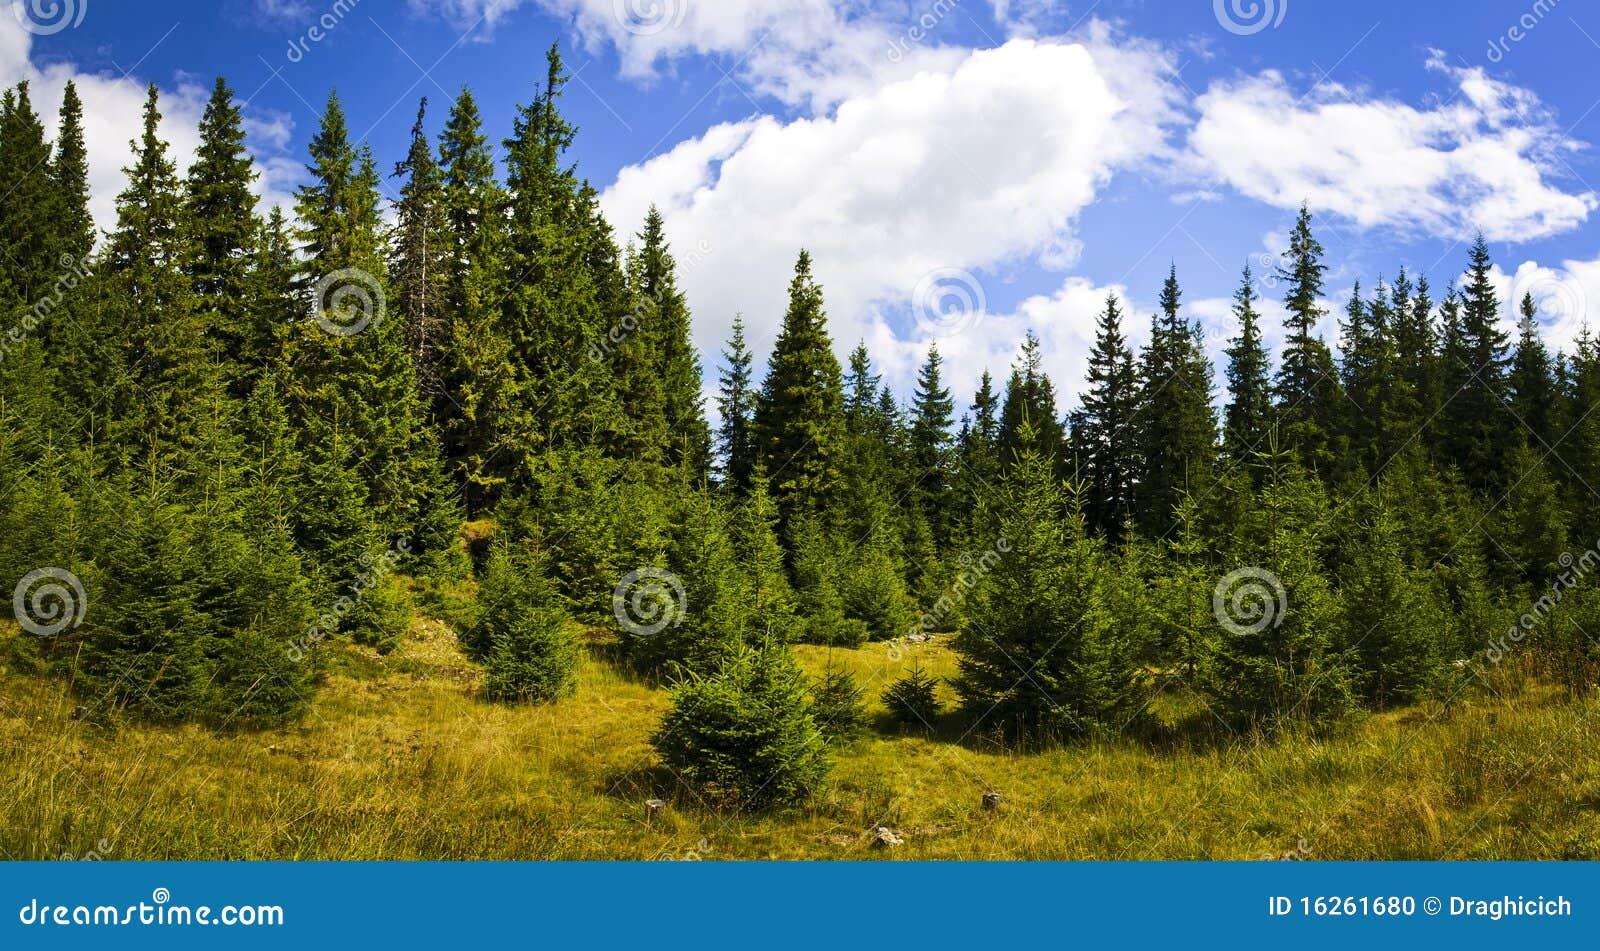 pine forest landscape